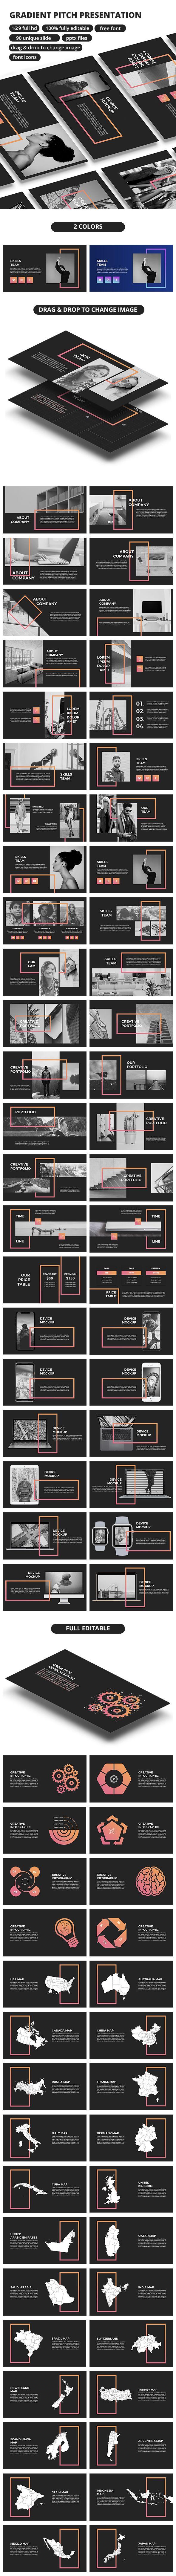 Gradient Pitch - PowerPoint Presentation - Business PowerPoint Templates